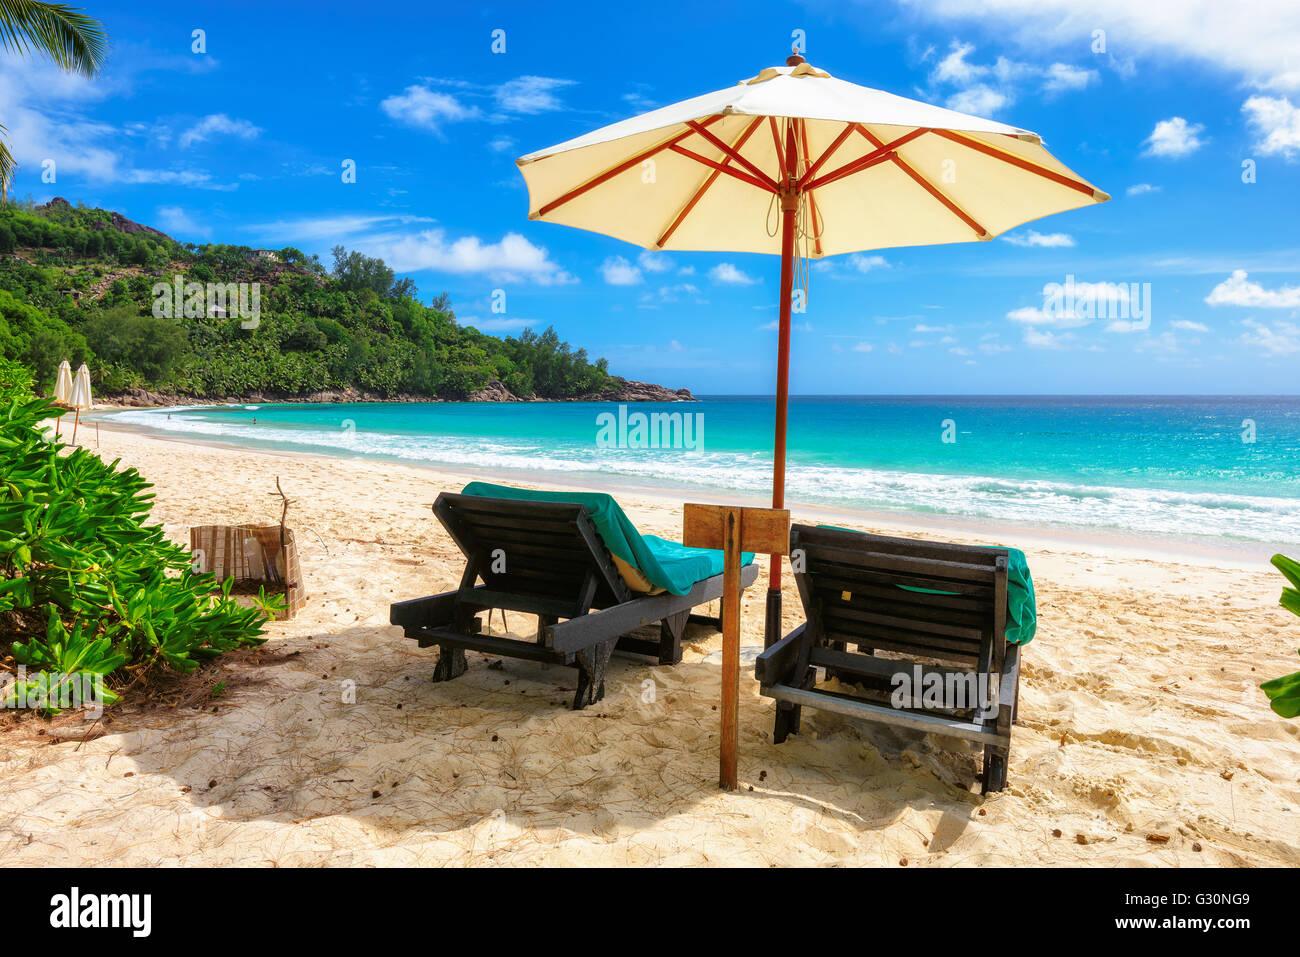 Umbrella and sun loungers on the beach, Anse Intendance, Mahe, Seychelles, Africa, Indian Ocean Stock Photo